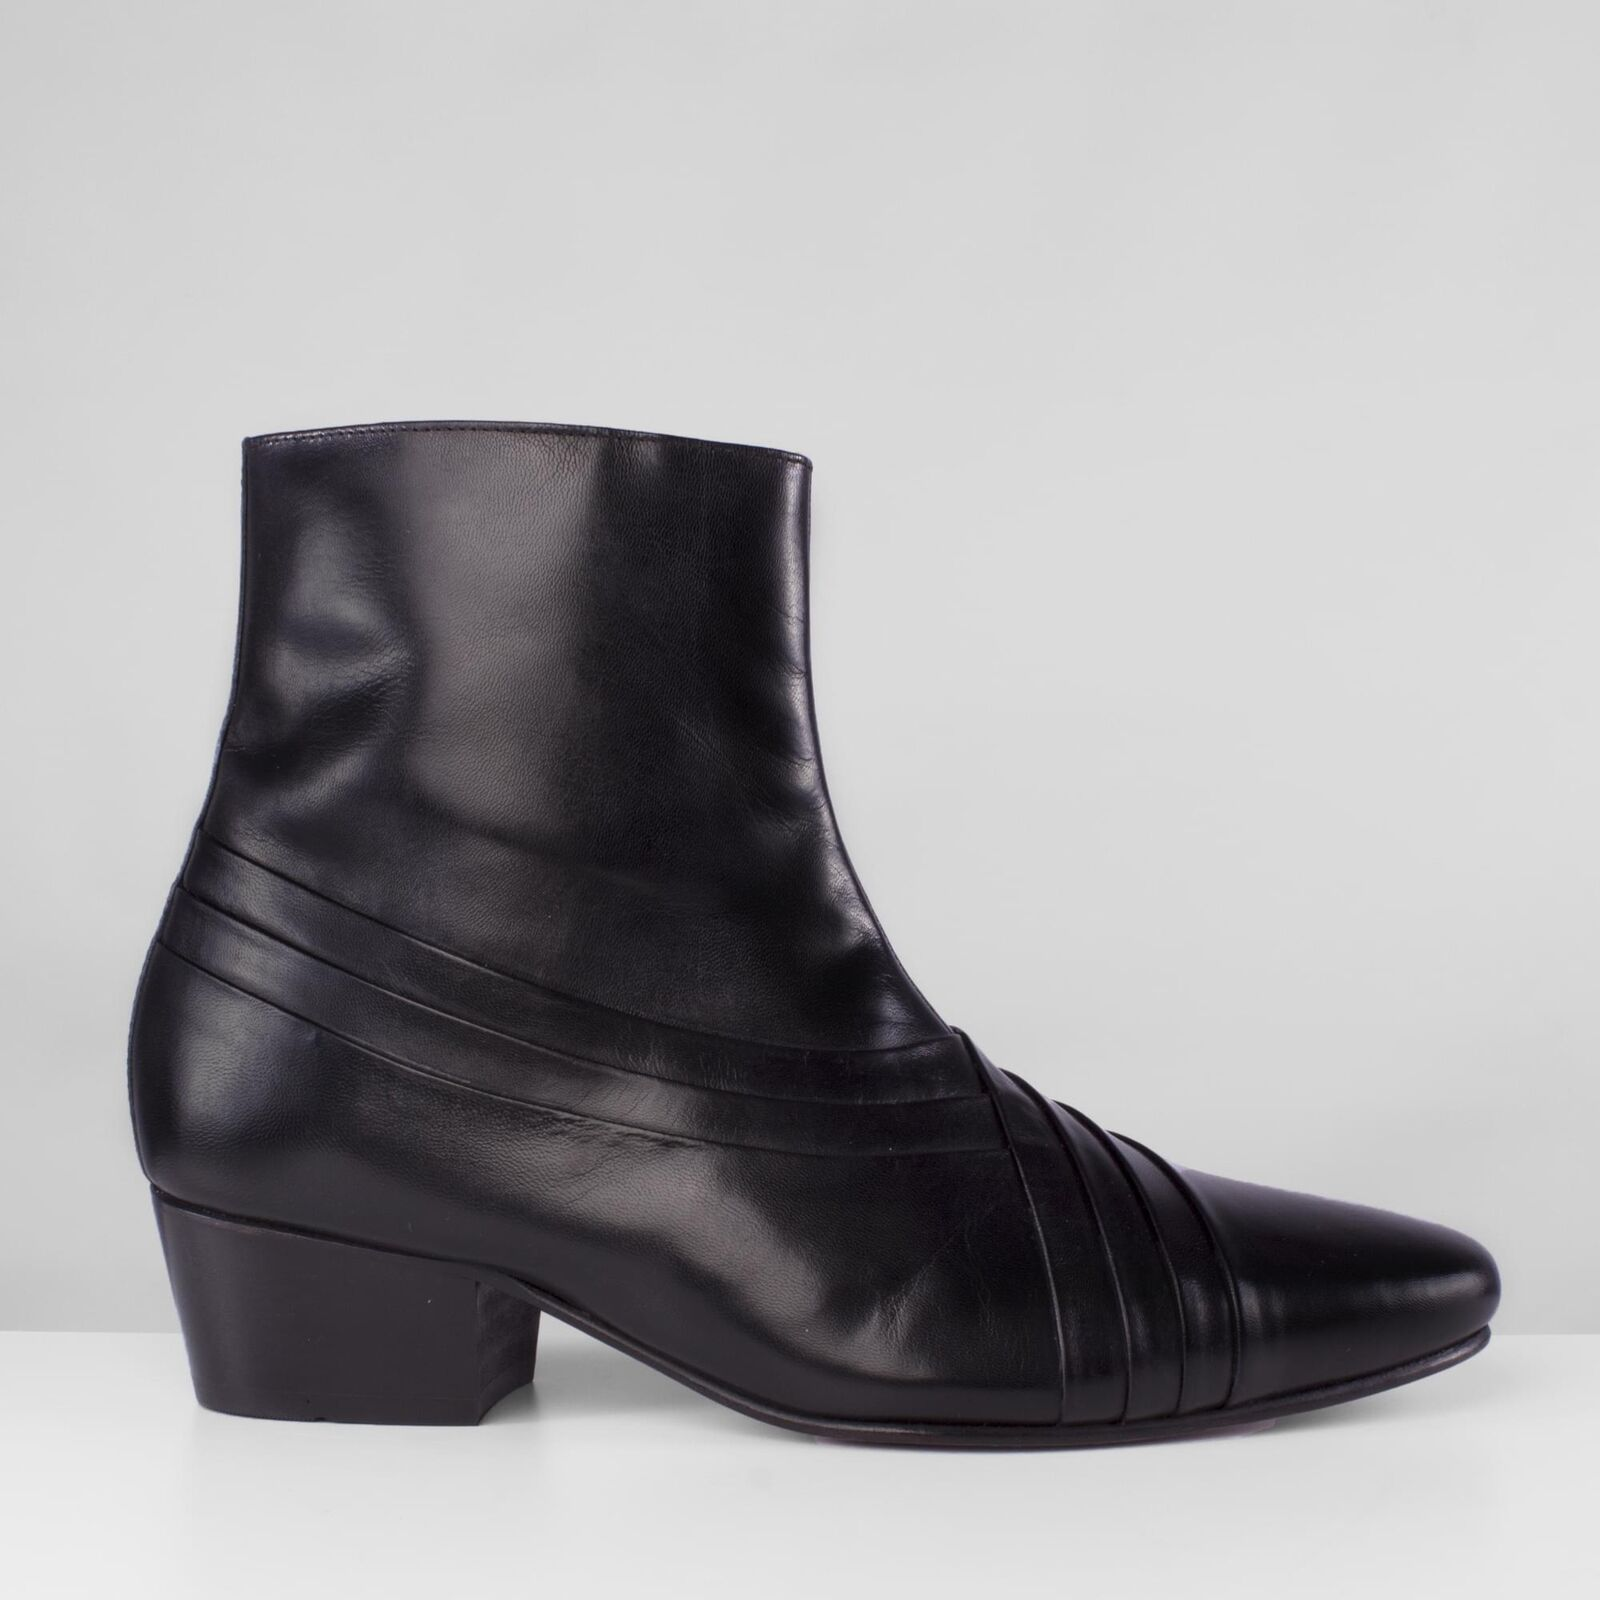 Club Cubano SALVATORE Mens Leather Formal Smart Evening Cuban Heel Boots Black